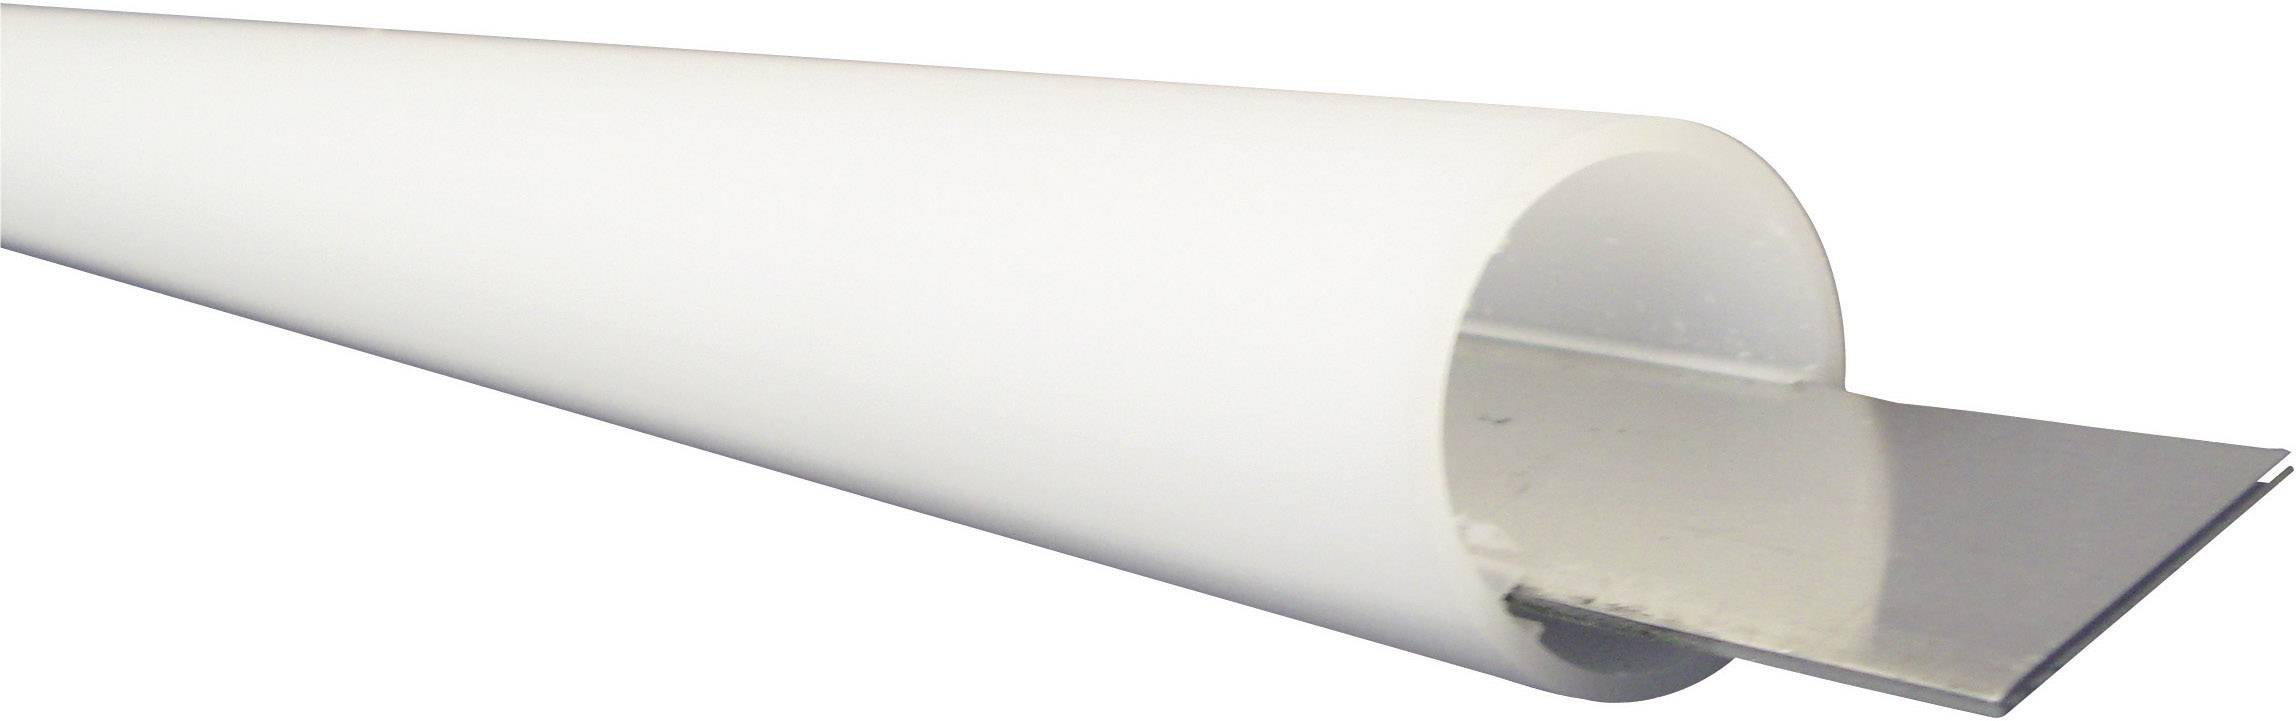 Heat Sink Universal Aluminium Schwarz Getriebe/ölk/ühler /Ölk/ühler-Kit 4//6//8 Reihen